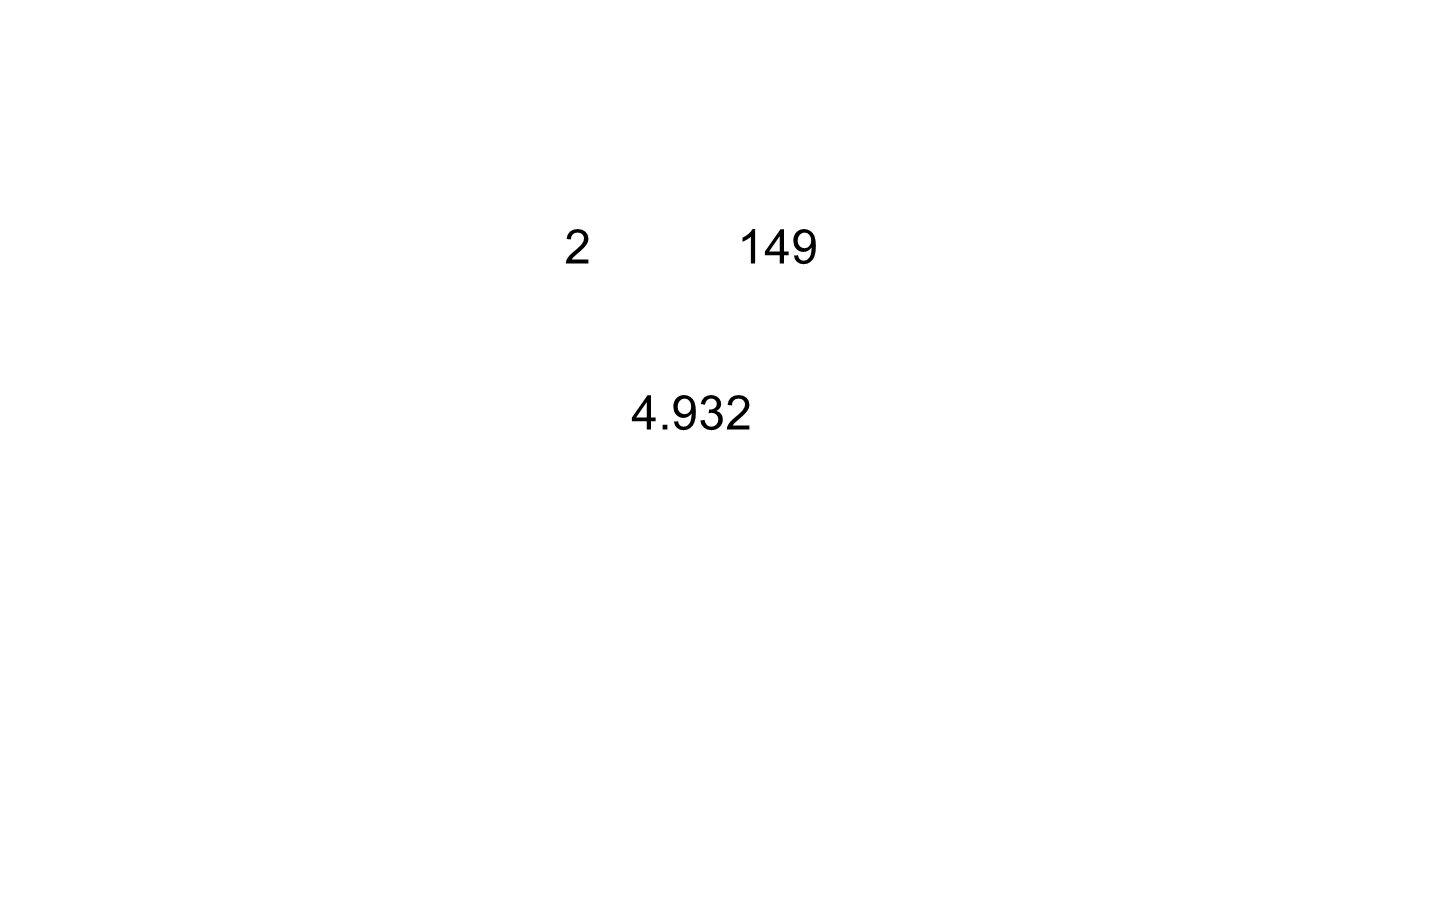 4.932